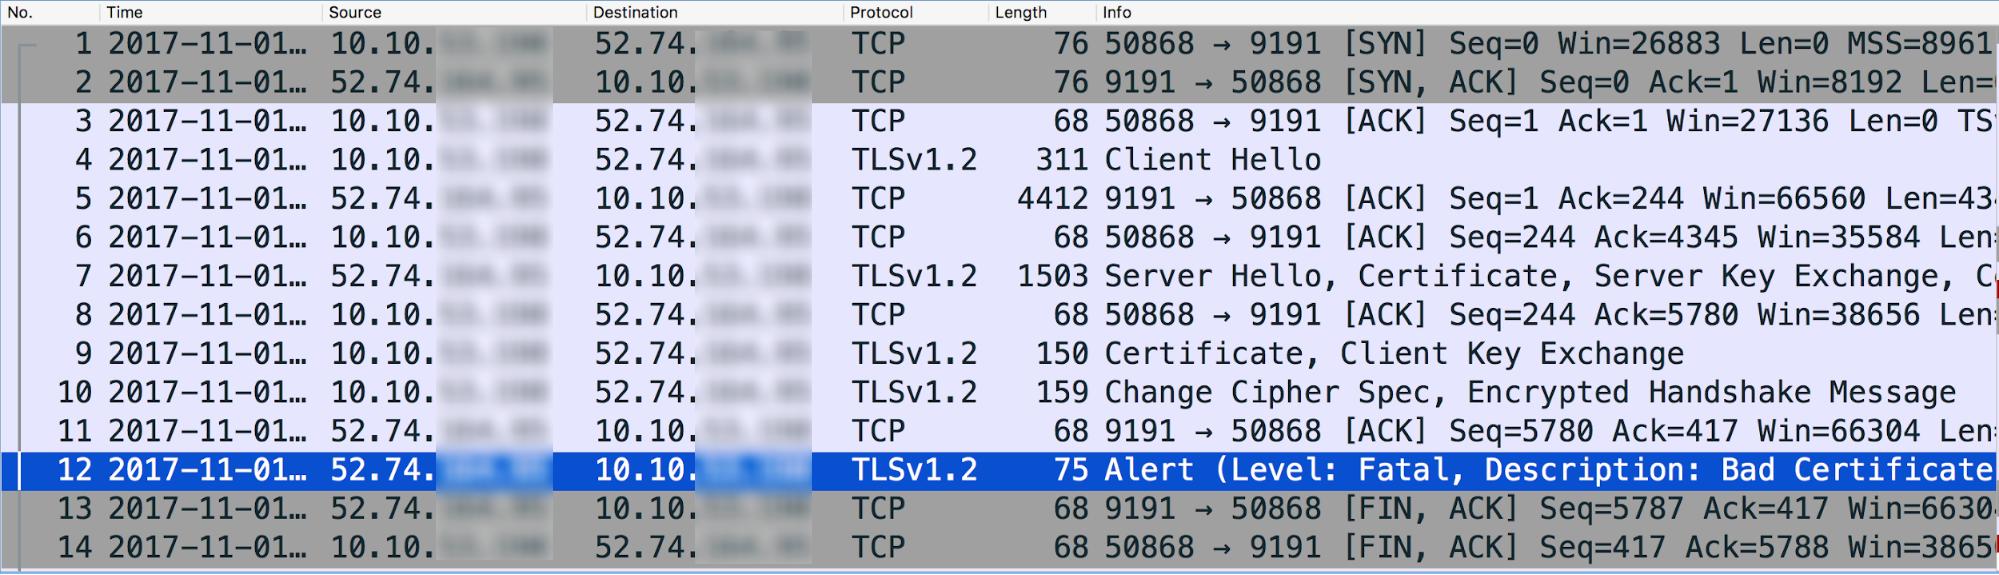 SSL Handshake Failures - Bad Client Certificate | Apigee Docs